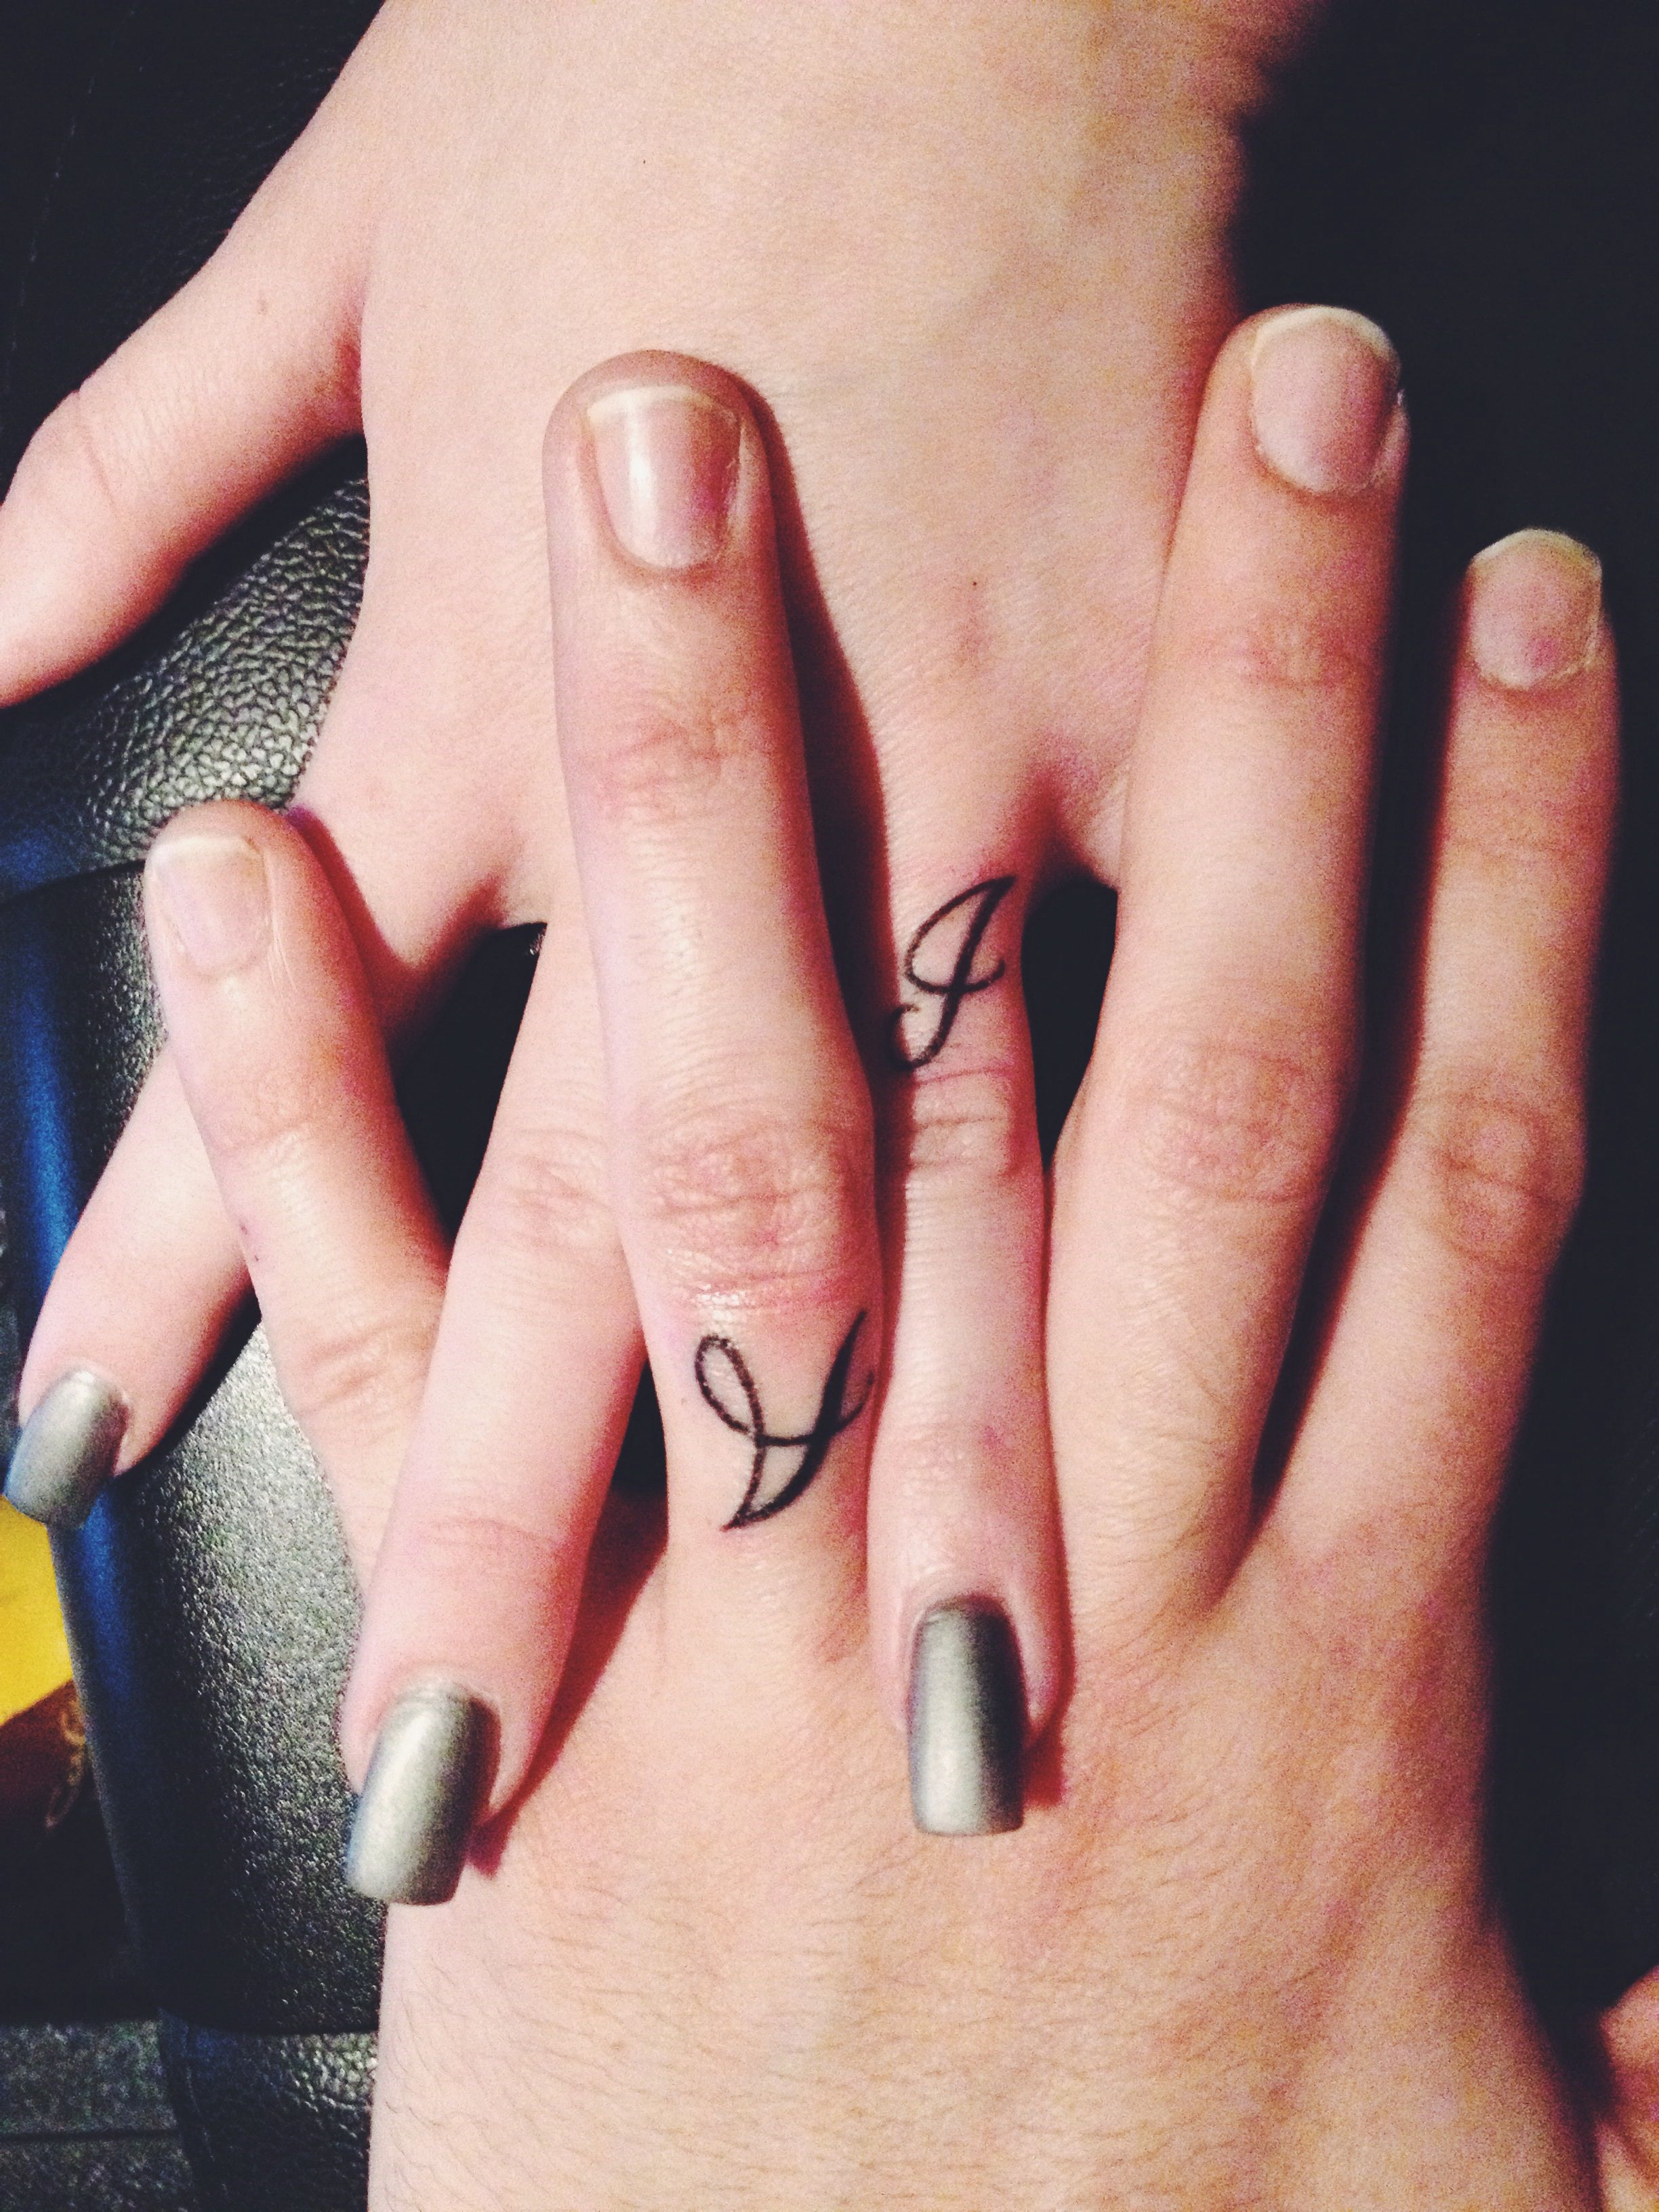 Marriage ring finger tattoos tattoos Pinterest Ring